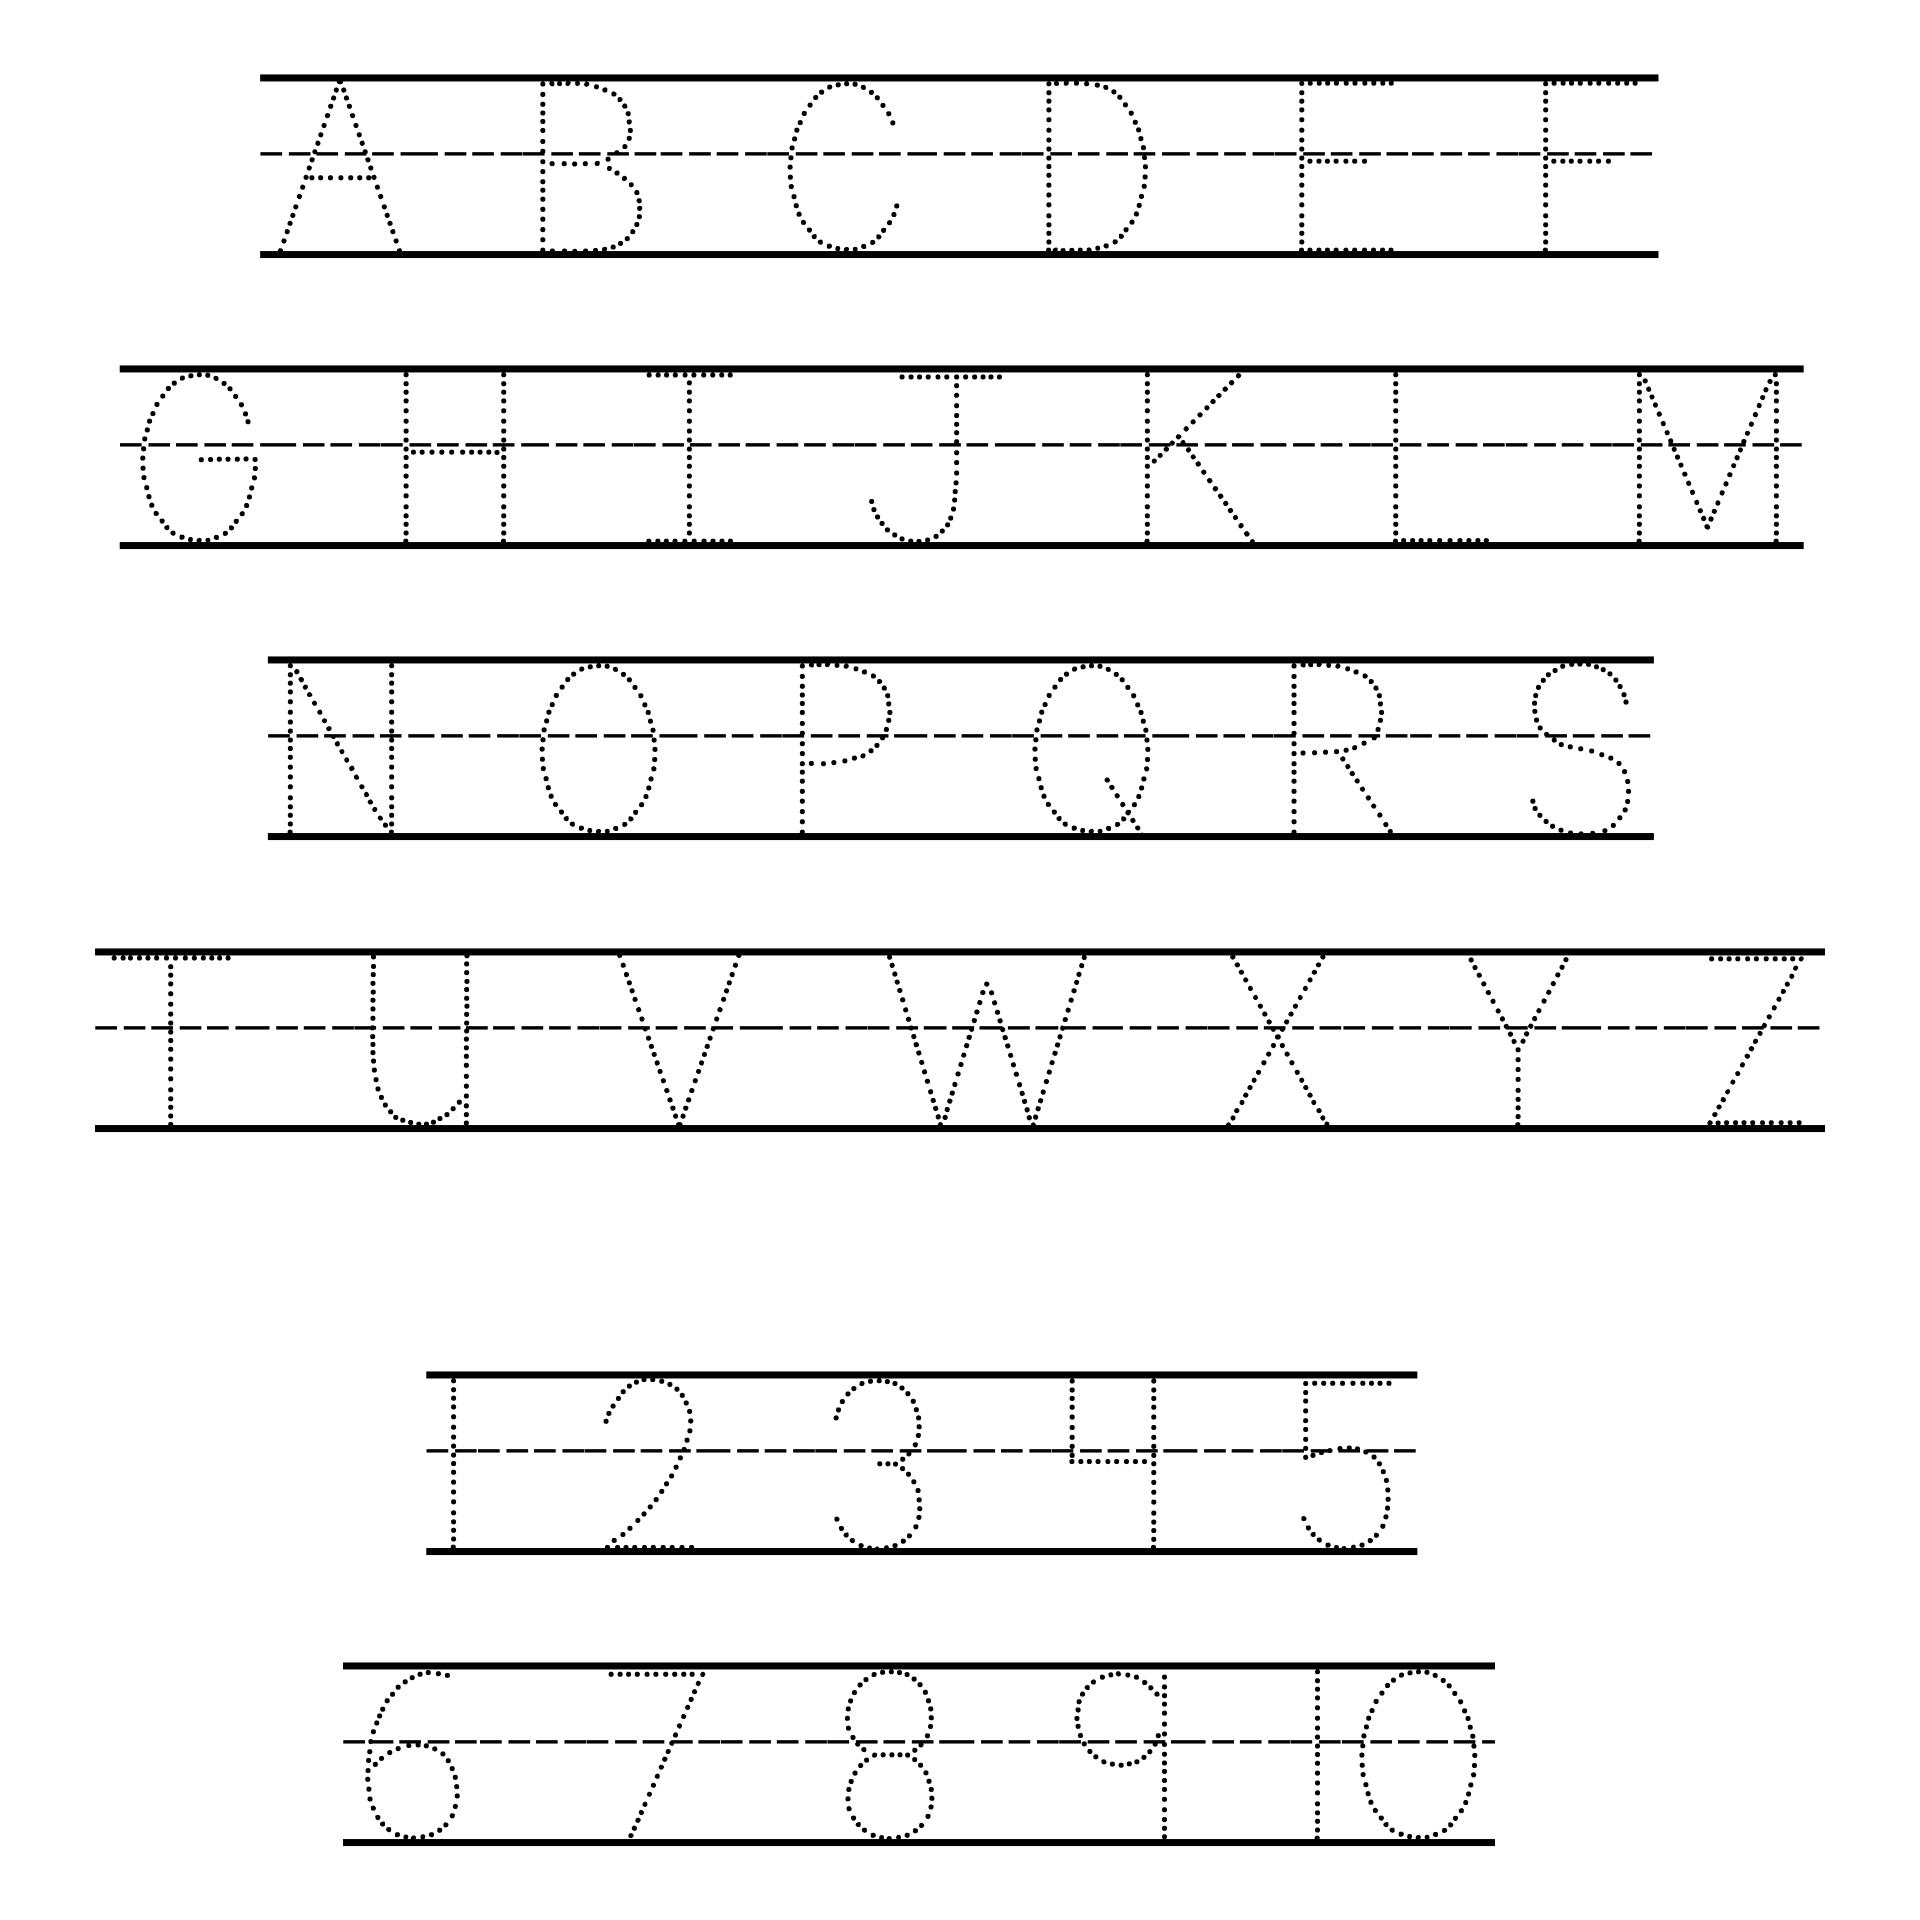 hight resolution of 6 Best Free ABC Worksheets Preschool Printables - printablee.com